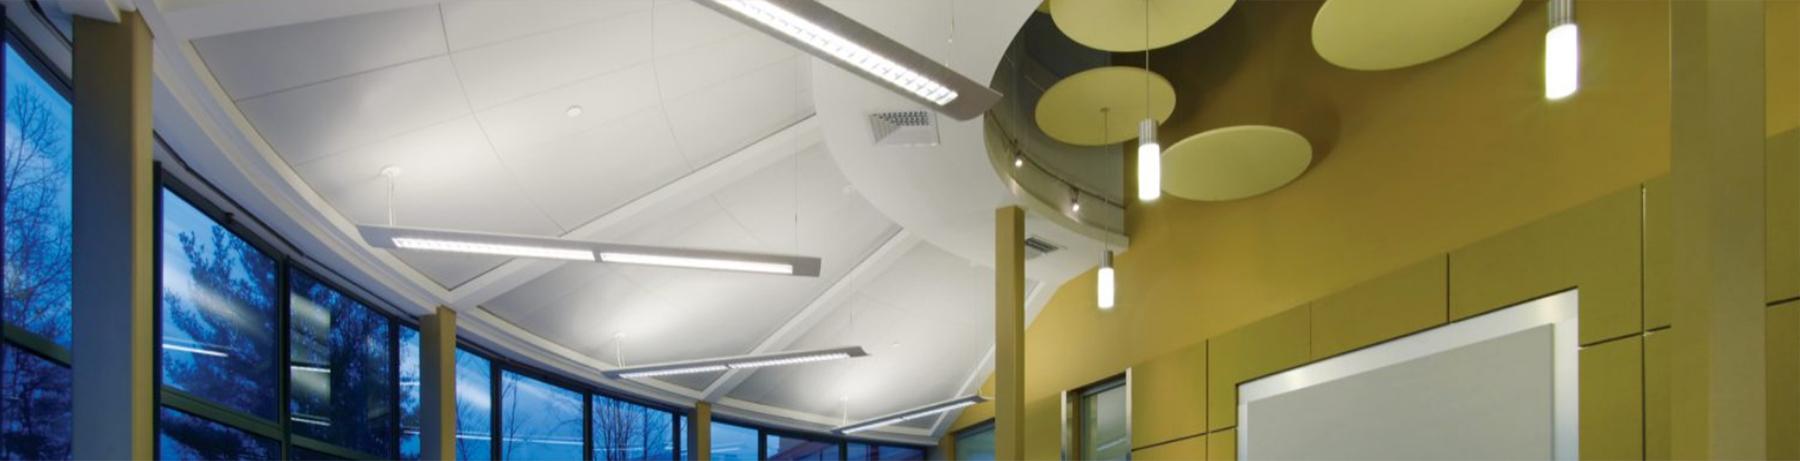 Acoustical Walls - Soundsoak Fabric Acoustical Wall Panels